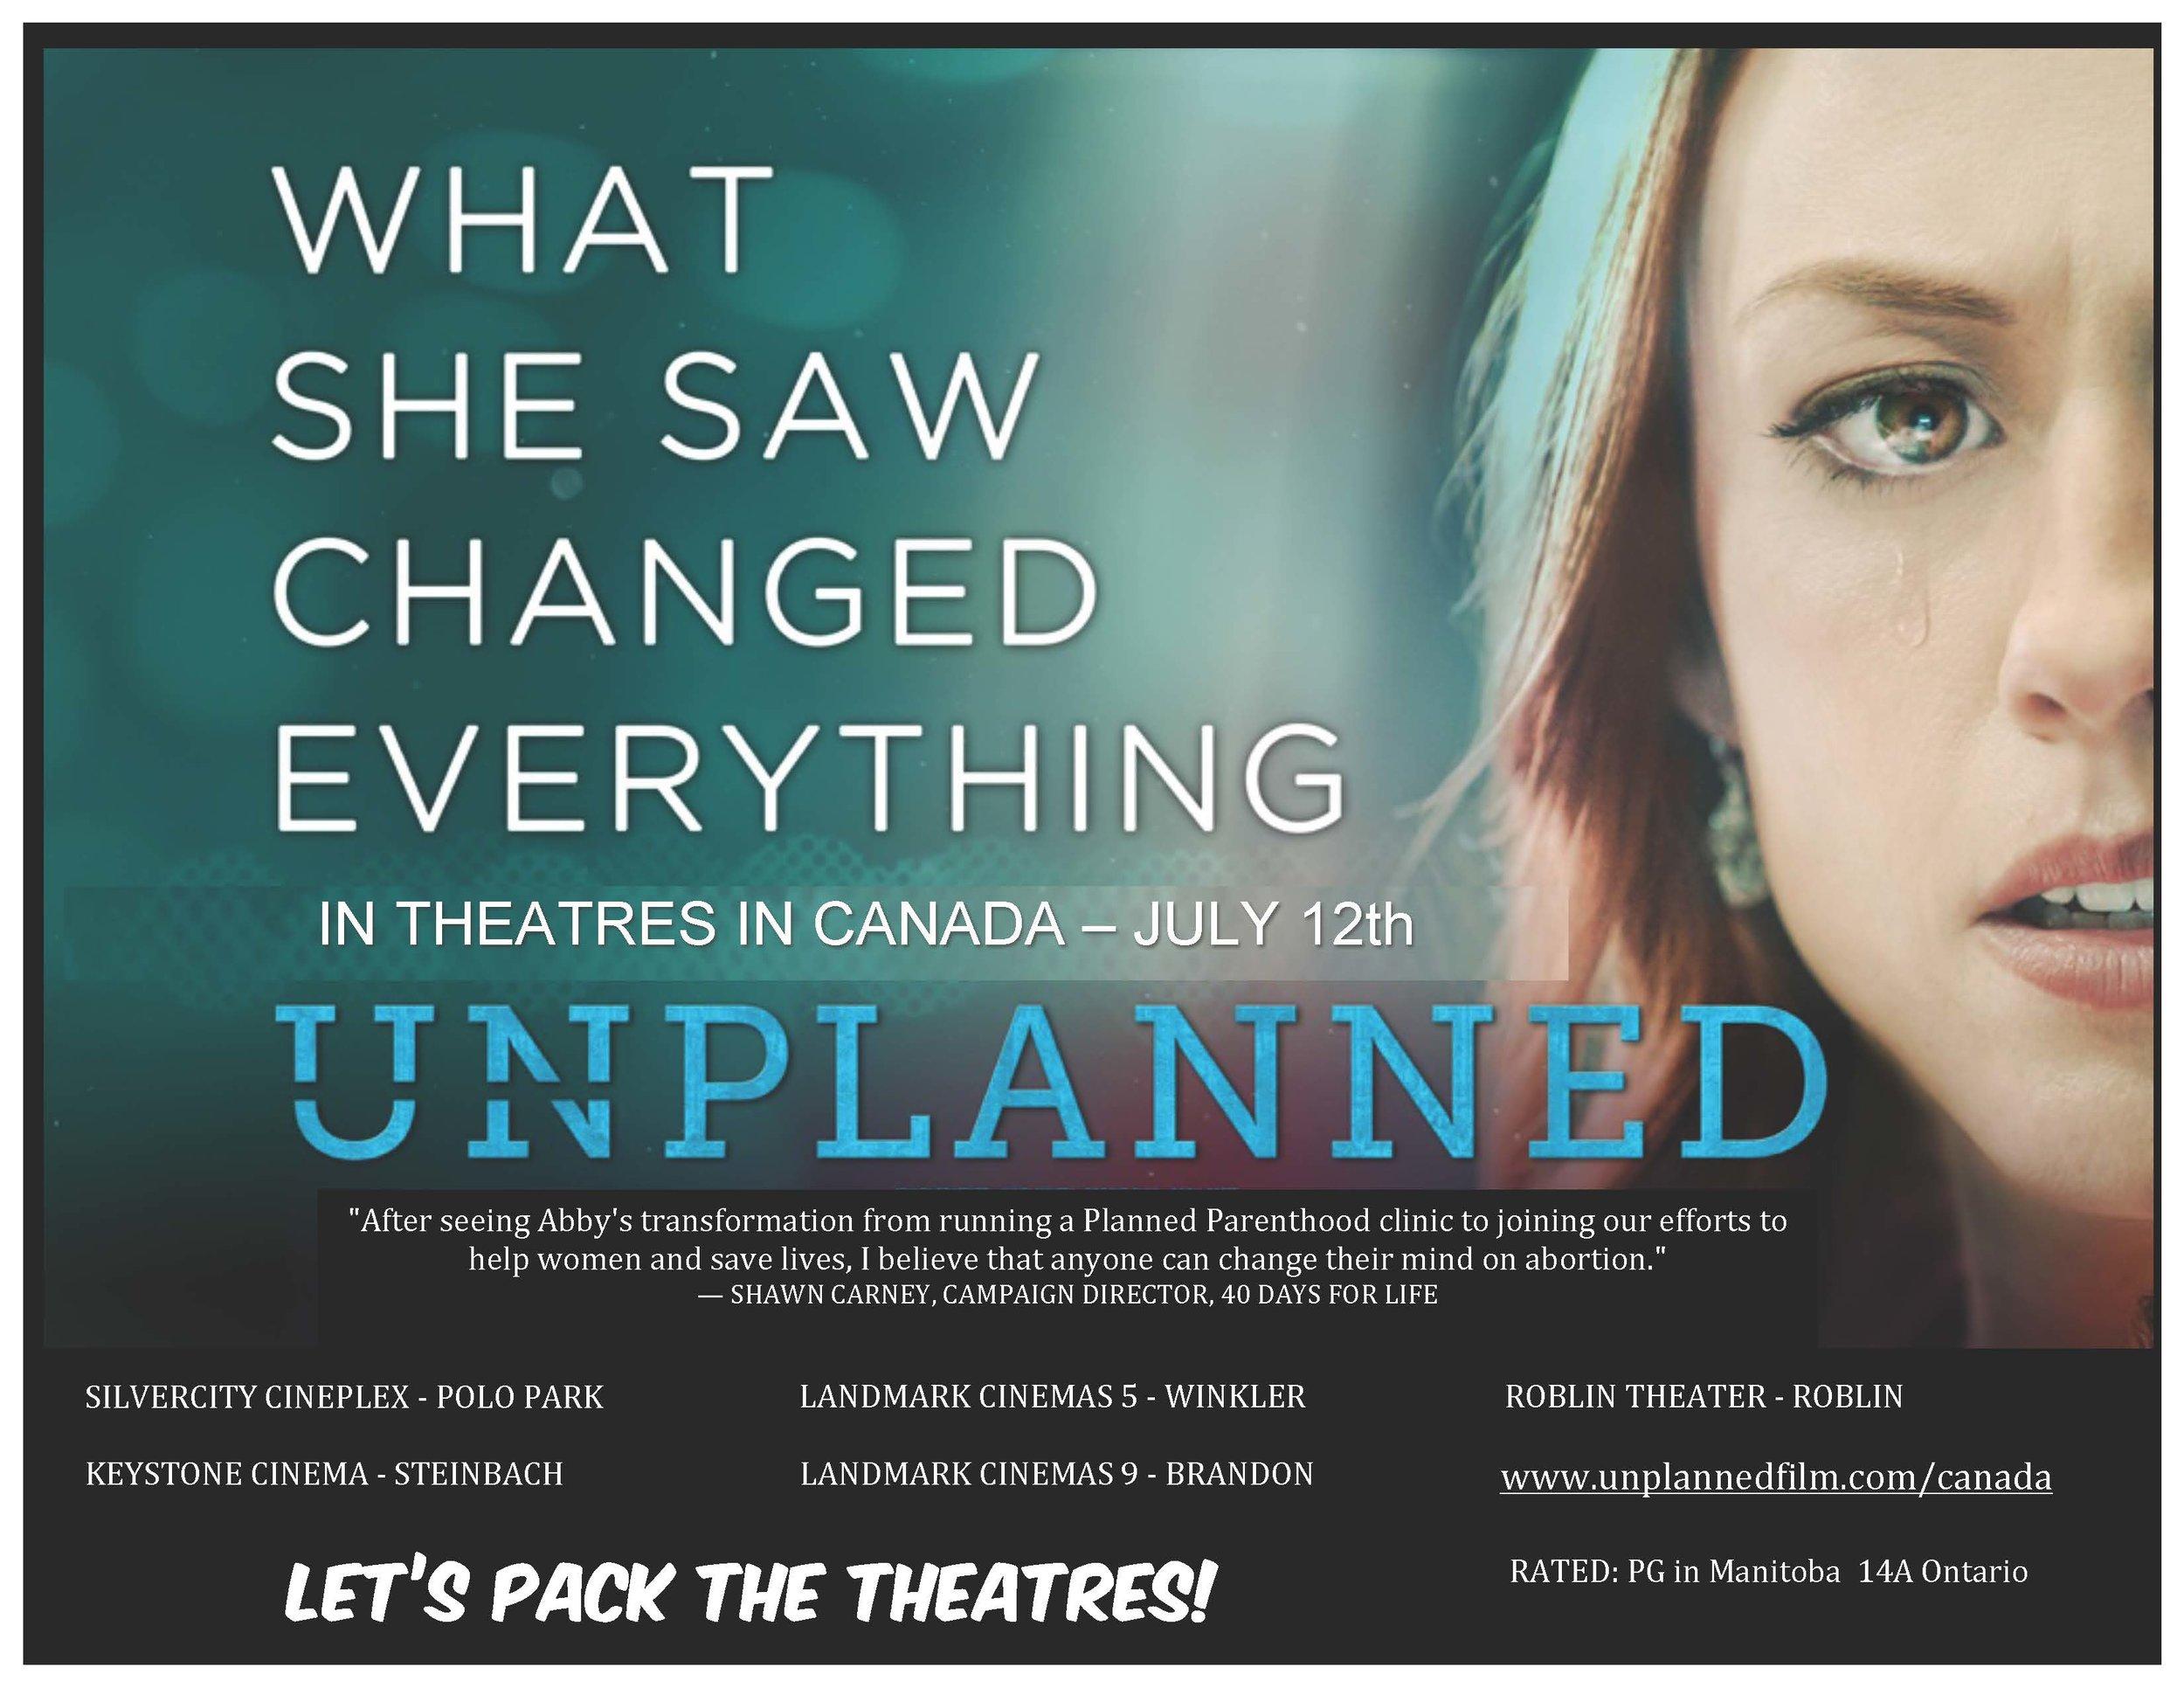 Unplanned-Canada-Poster.jpg